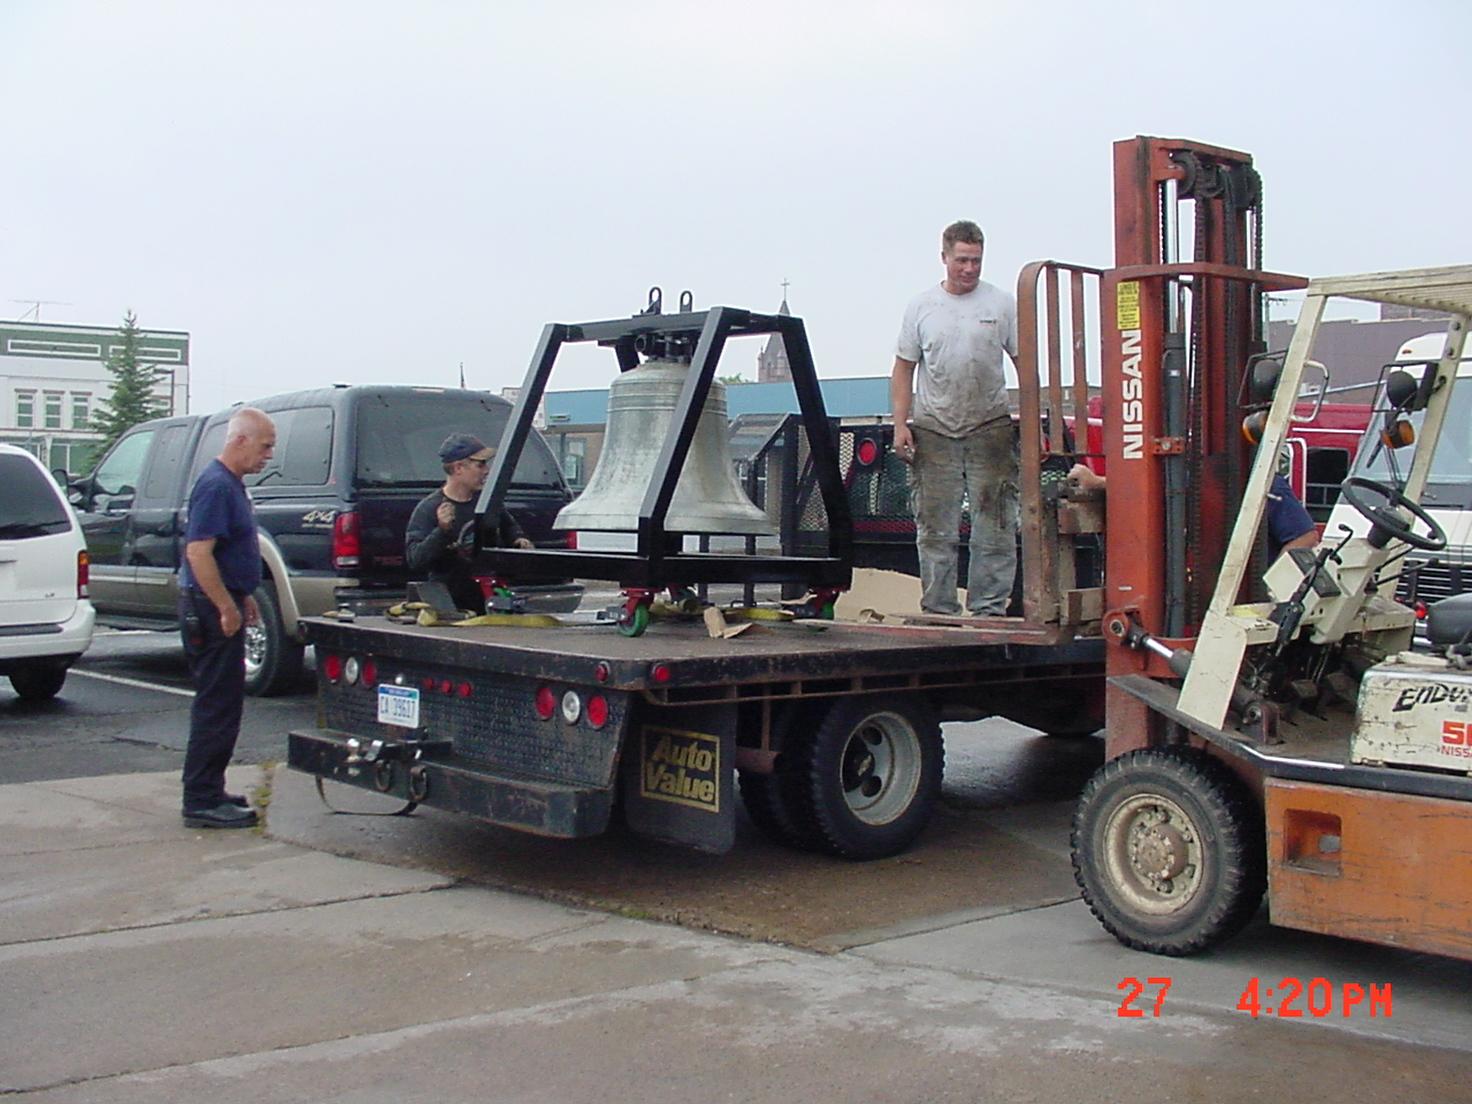 7-27-2007 - Return of The Bell 001